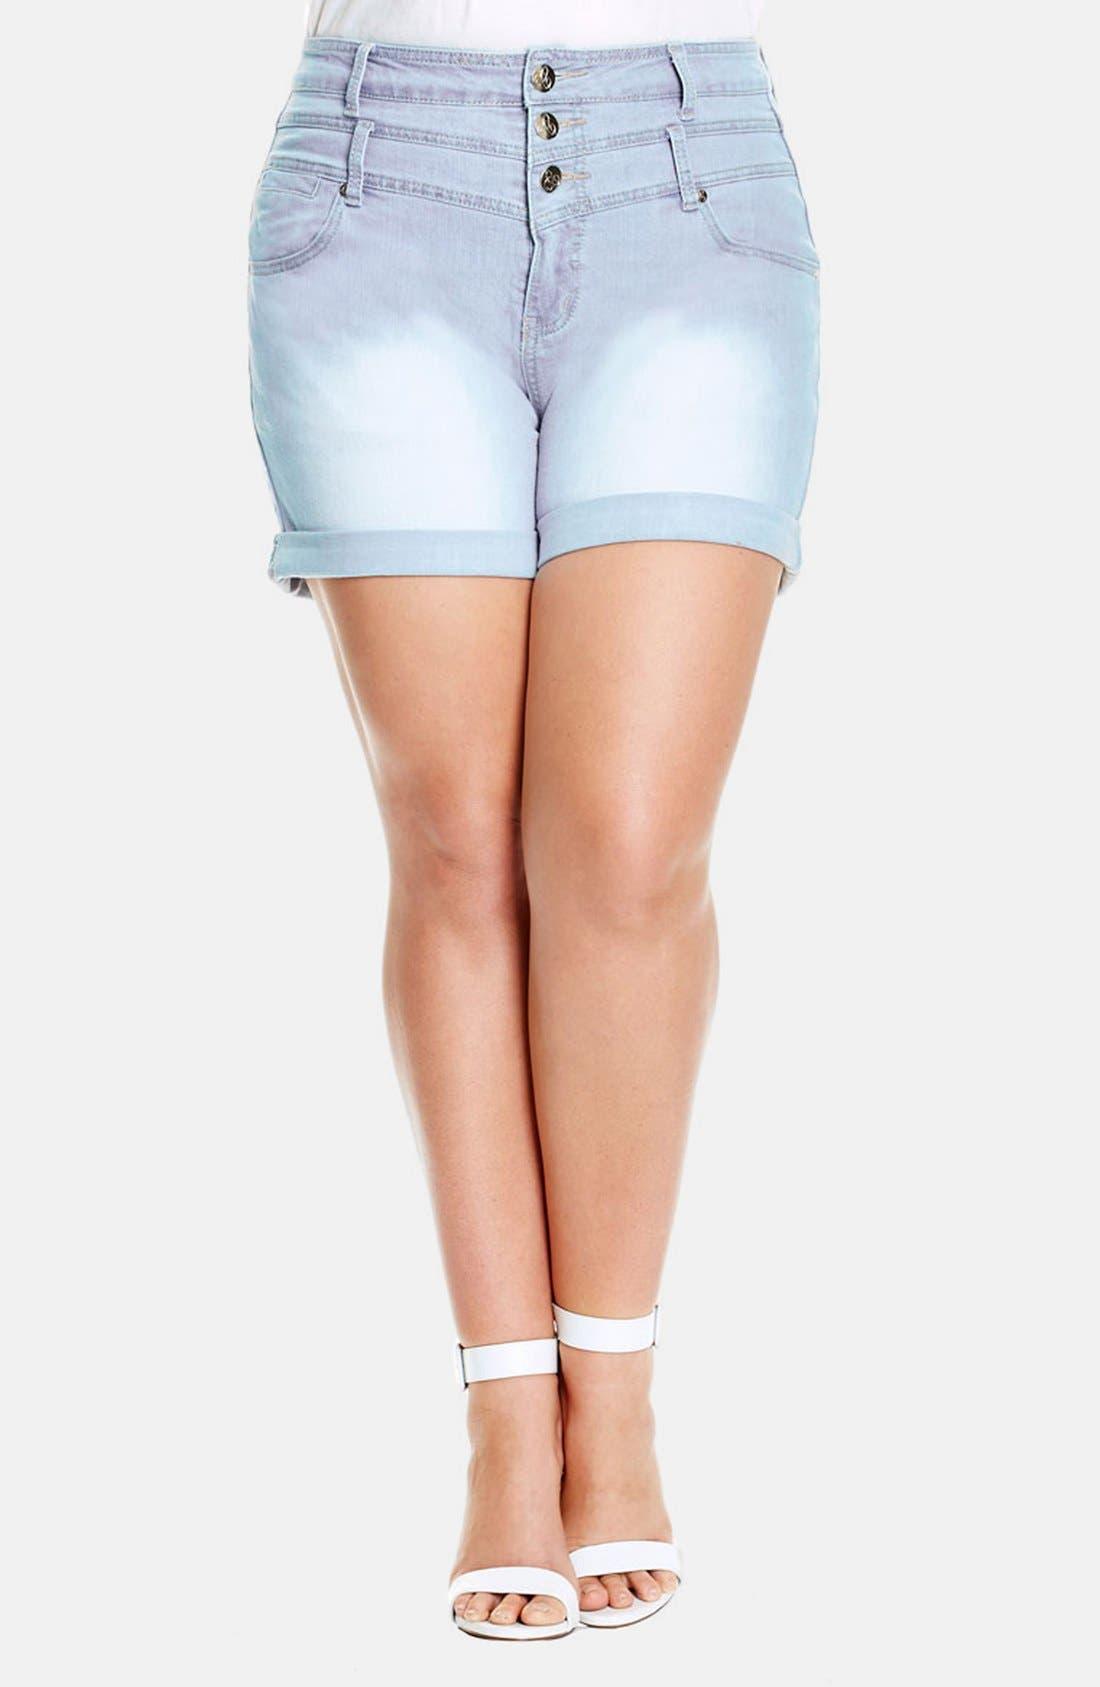 Alternate Image 1 Selected - City Chic High Waist Denim Shorts (Plus Size)